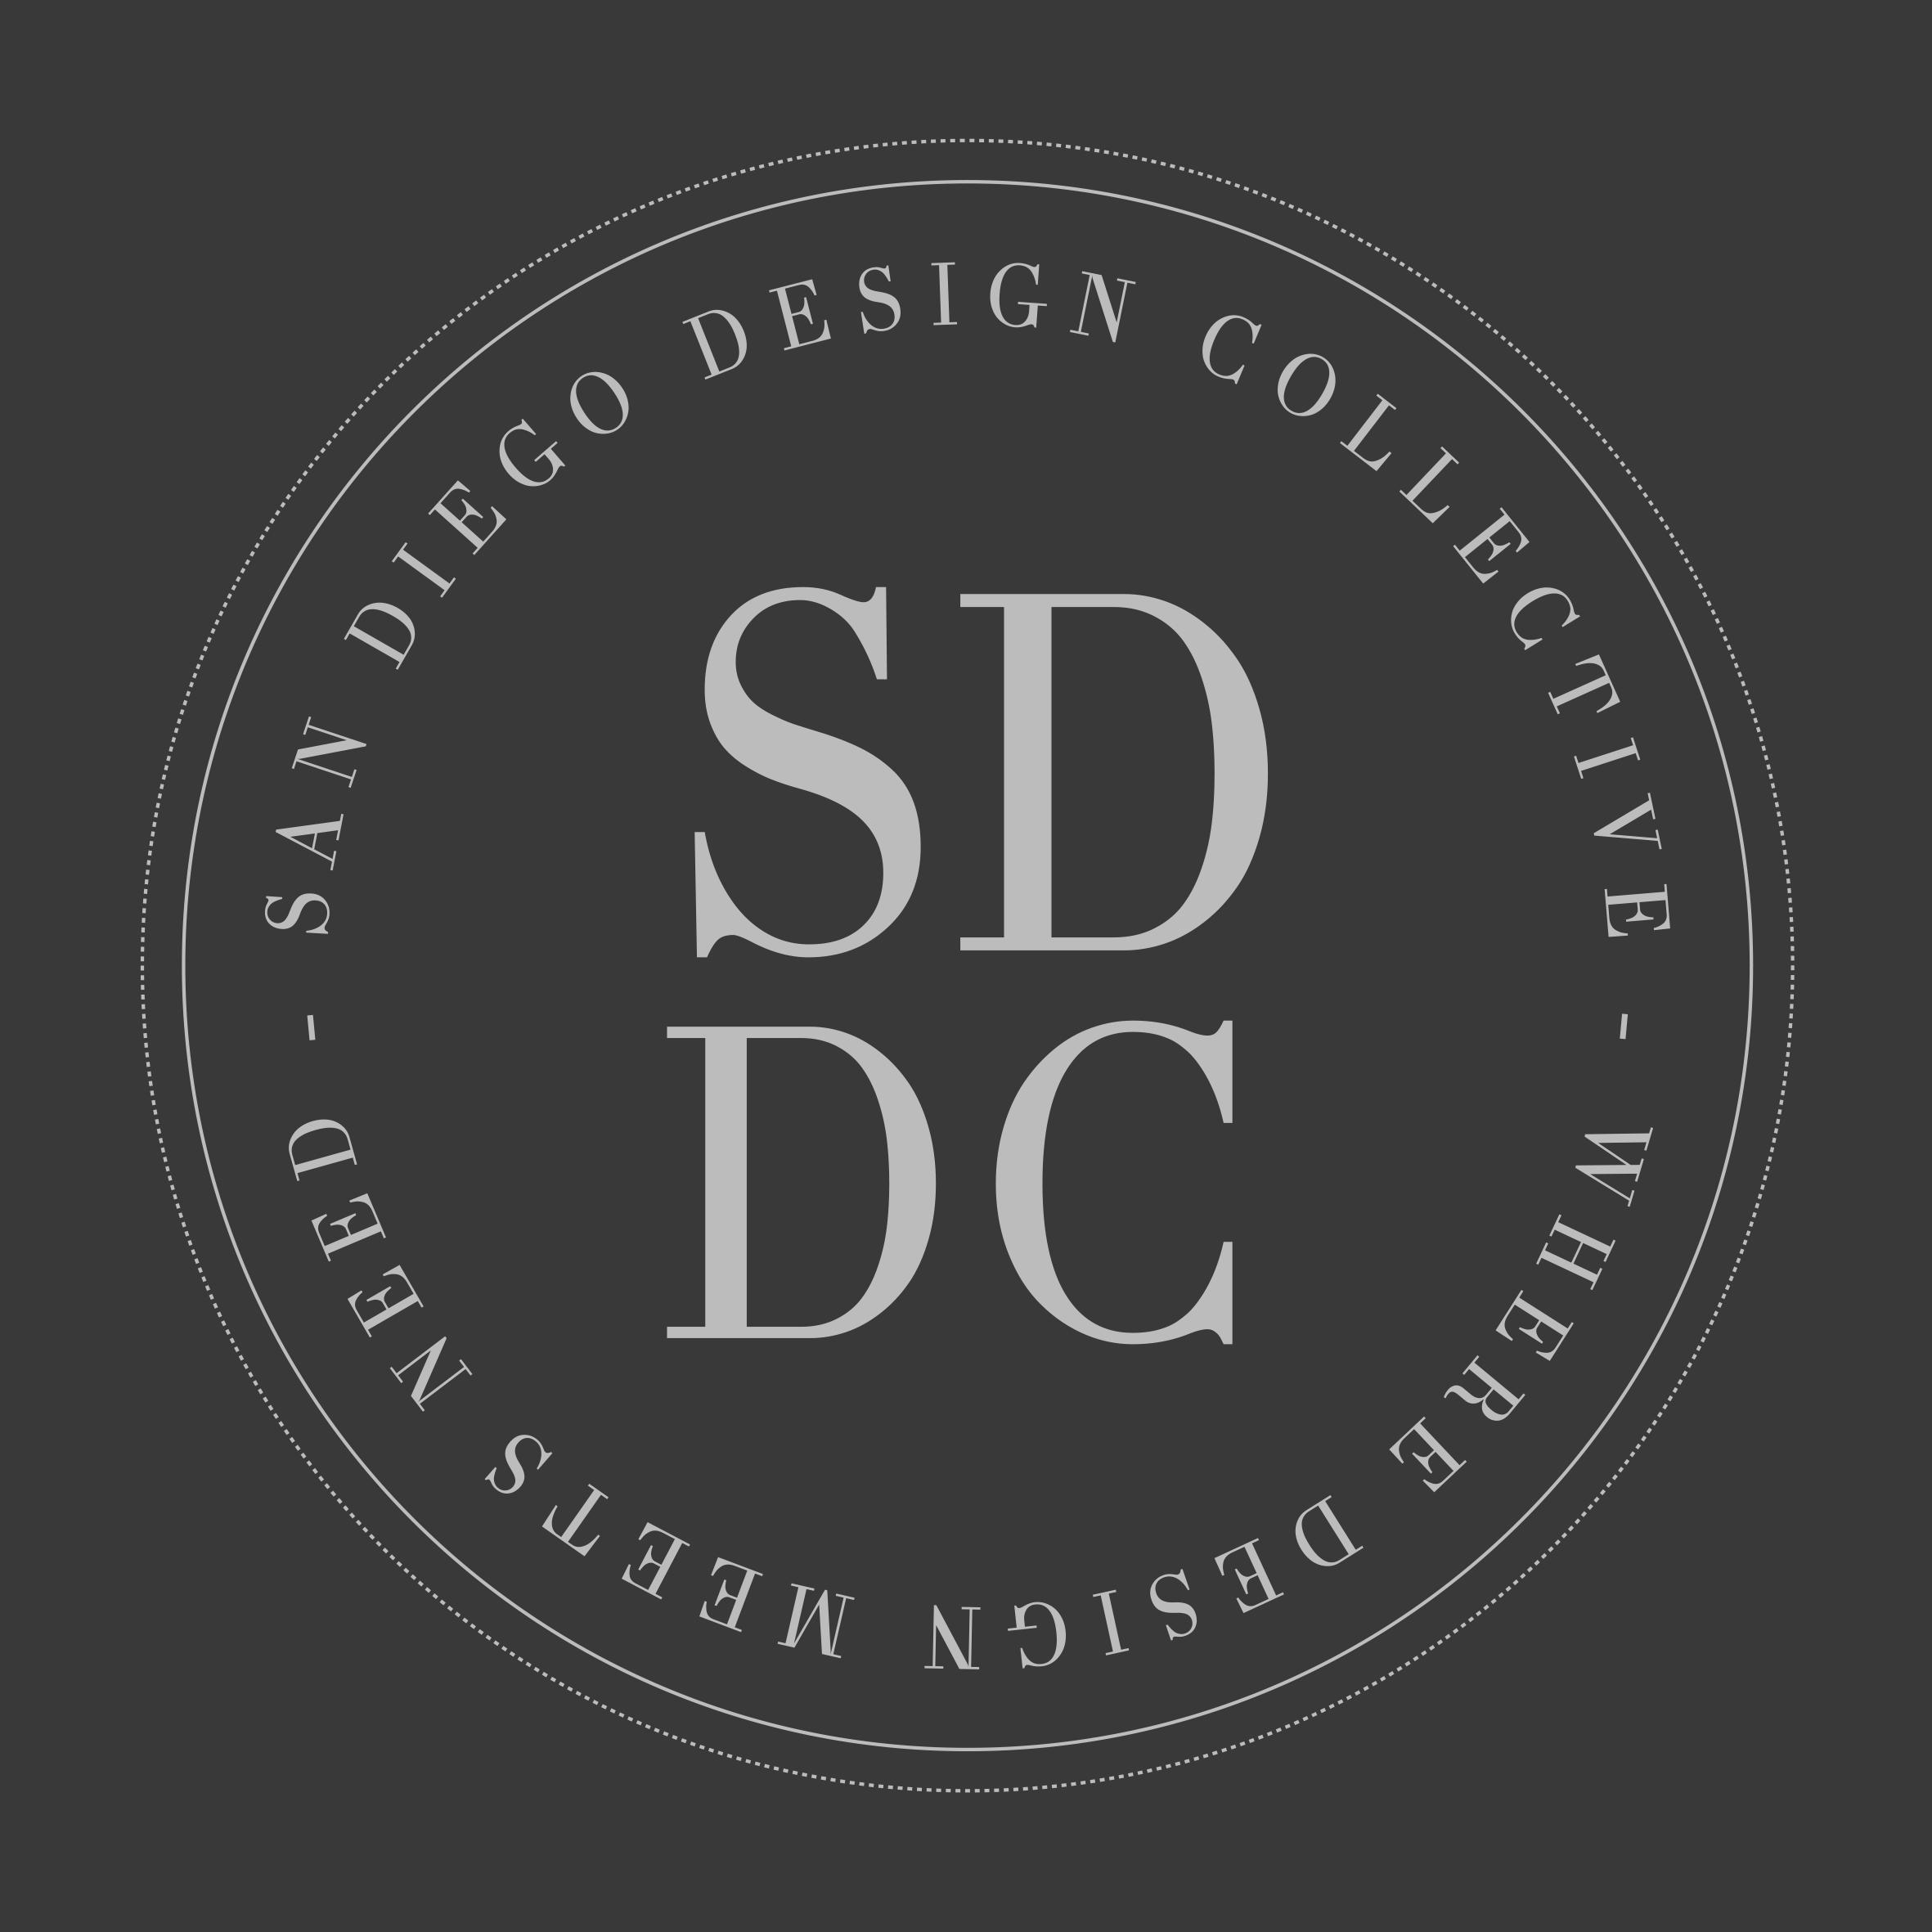 San Diego Design Collective